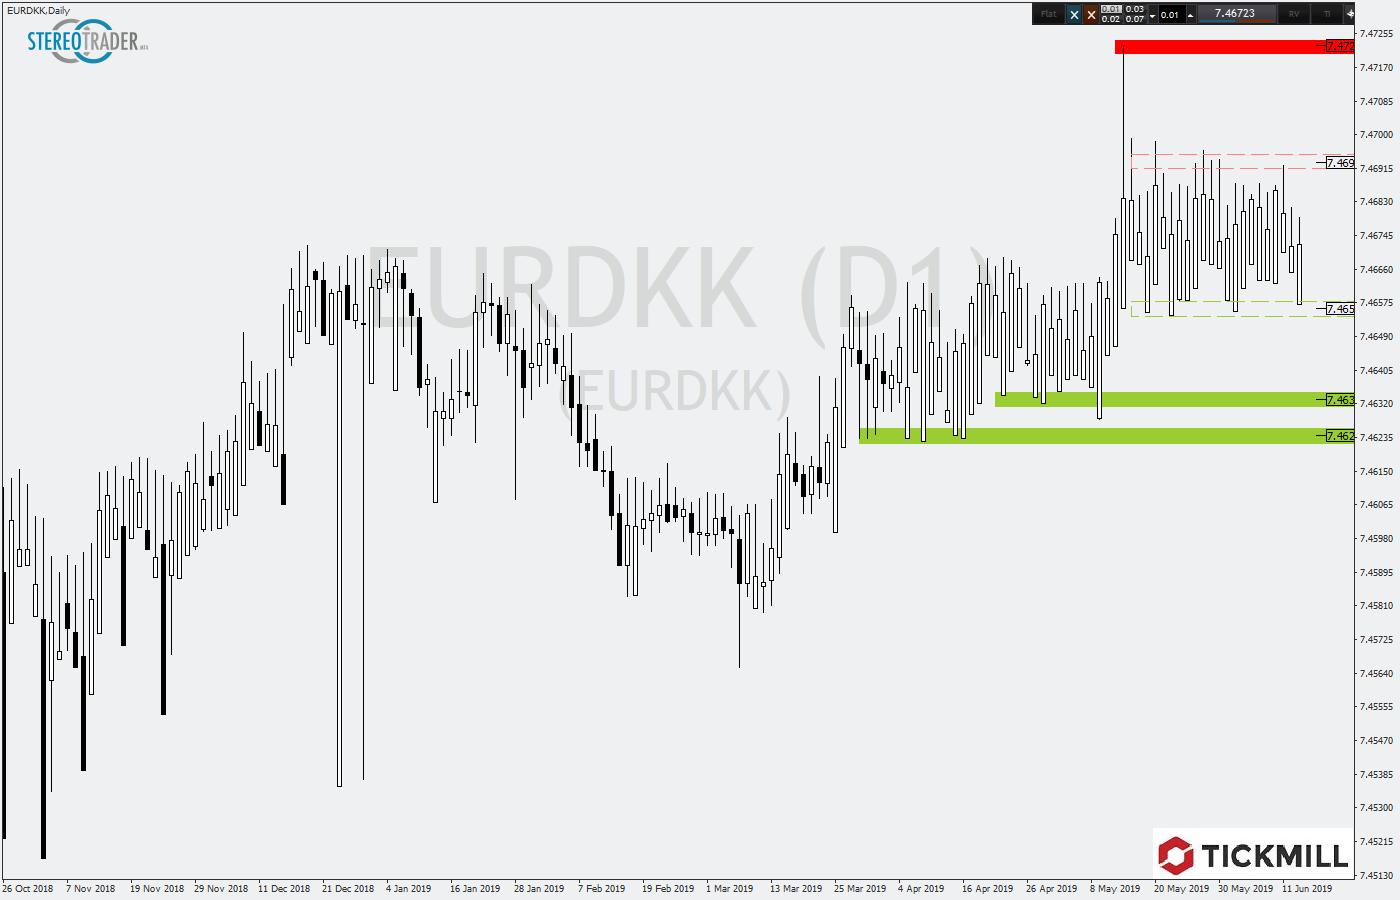 Tickmill-Analyse: EURDKK mit Tradingrange